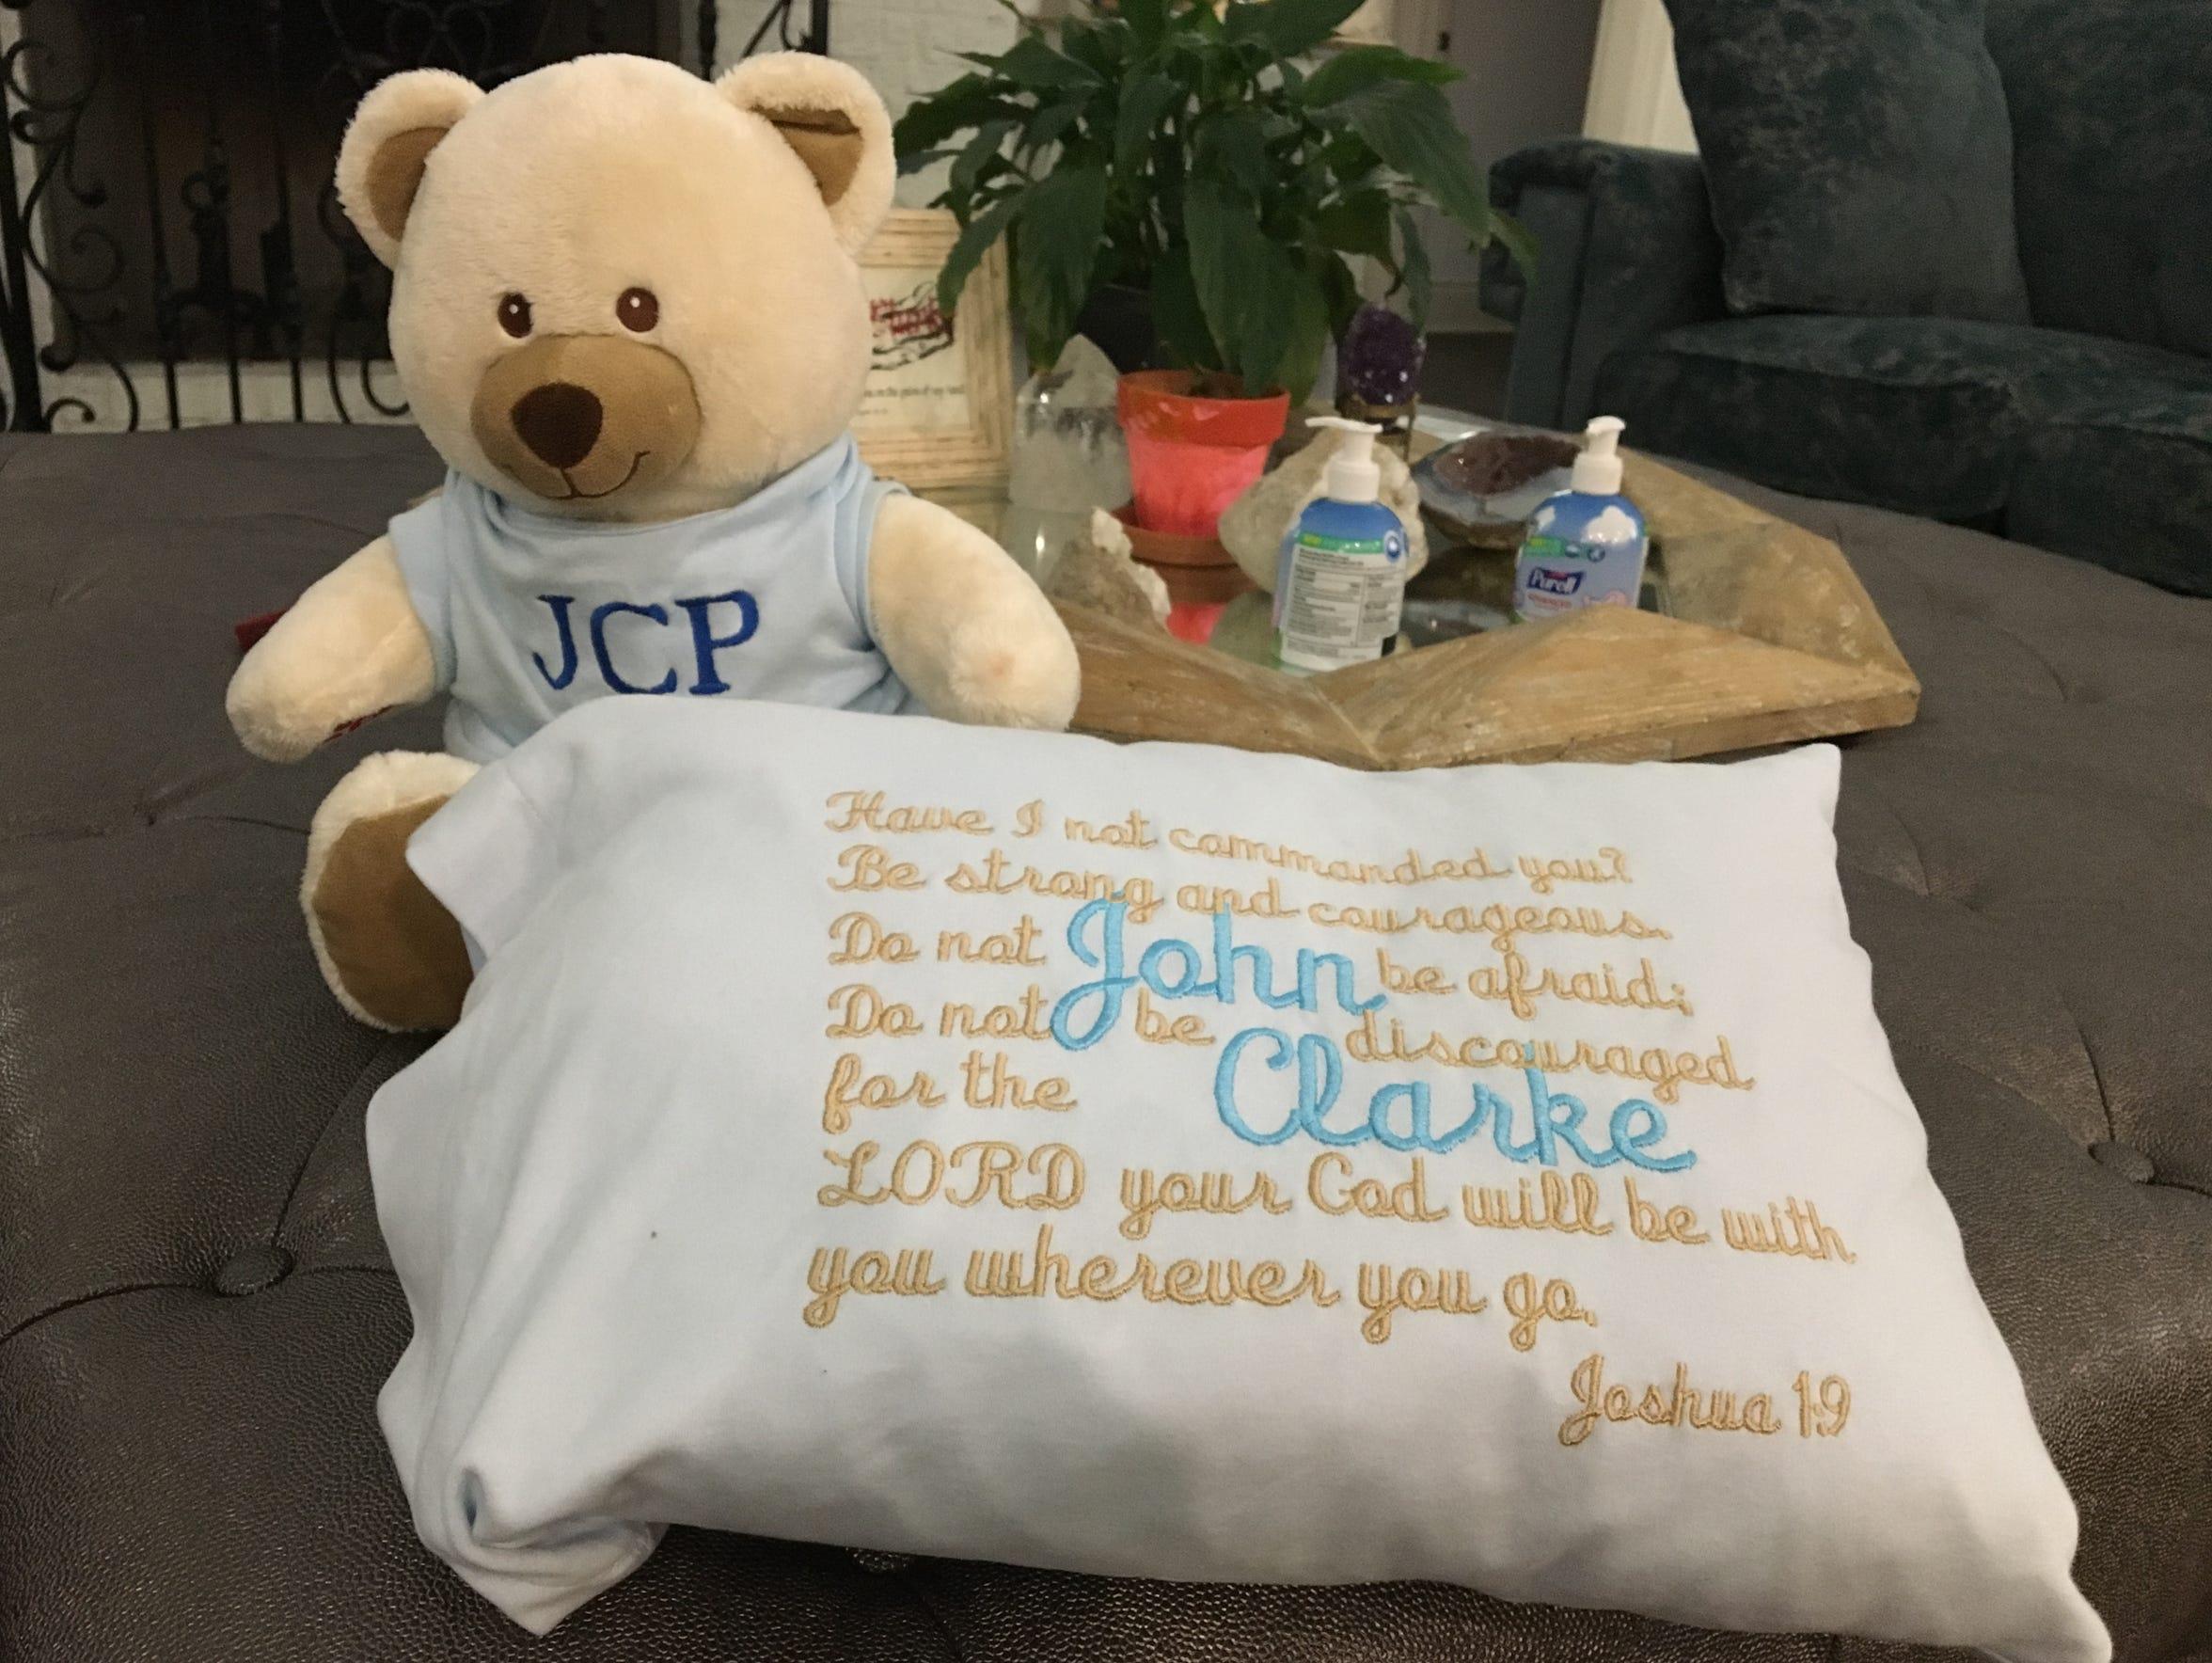 A teddy bear featuring a recording of John Clarke's